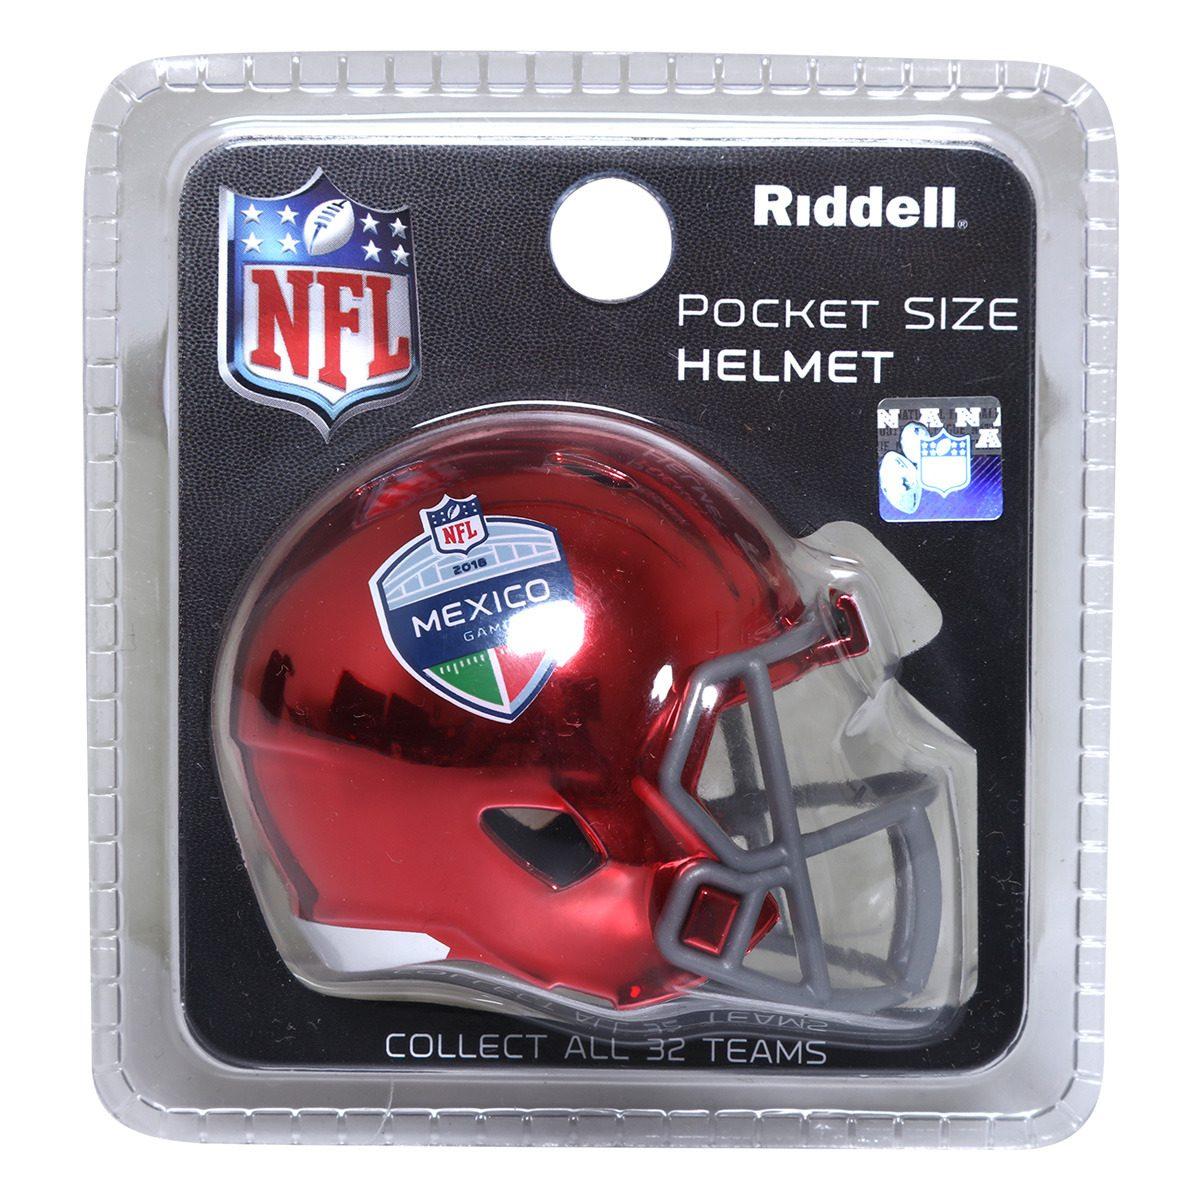 9cb050cd0c011 mini casco pocket nfl rojo cromado méxico edicion especial. Cargando zoom.